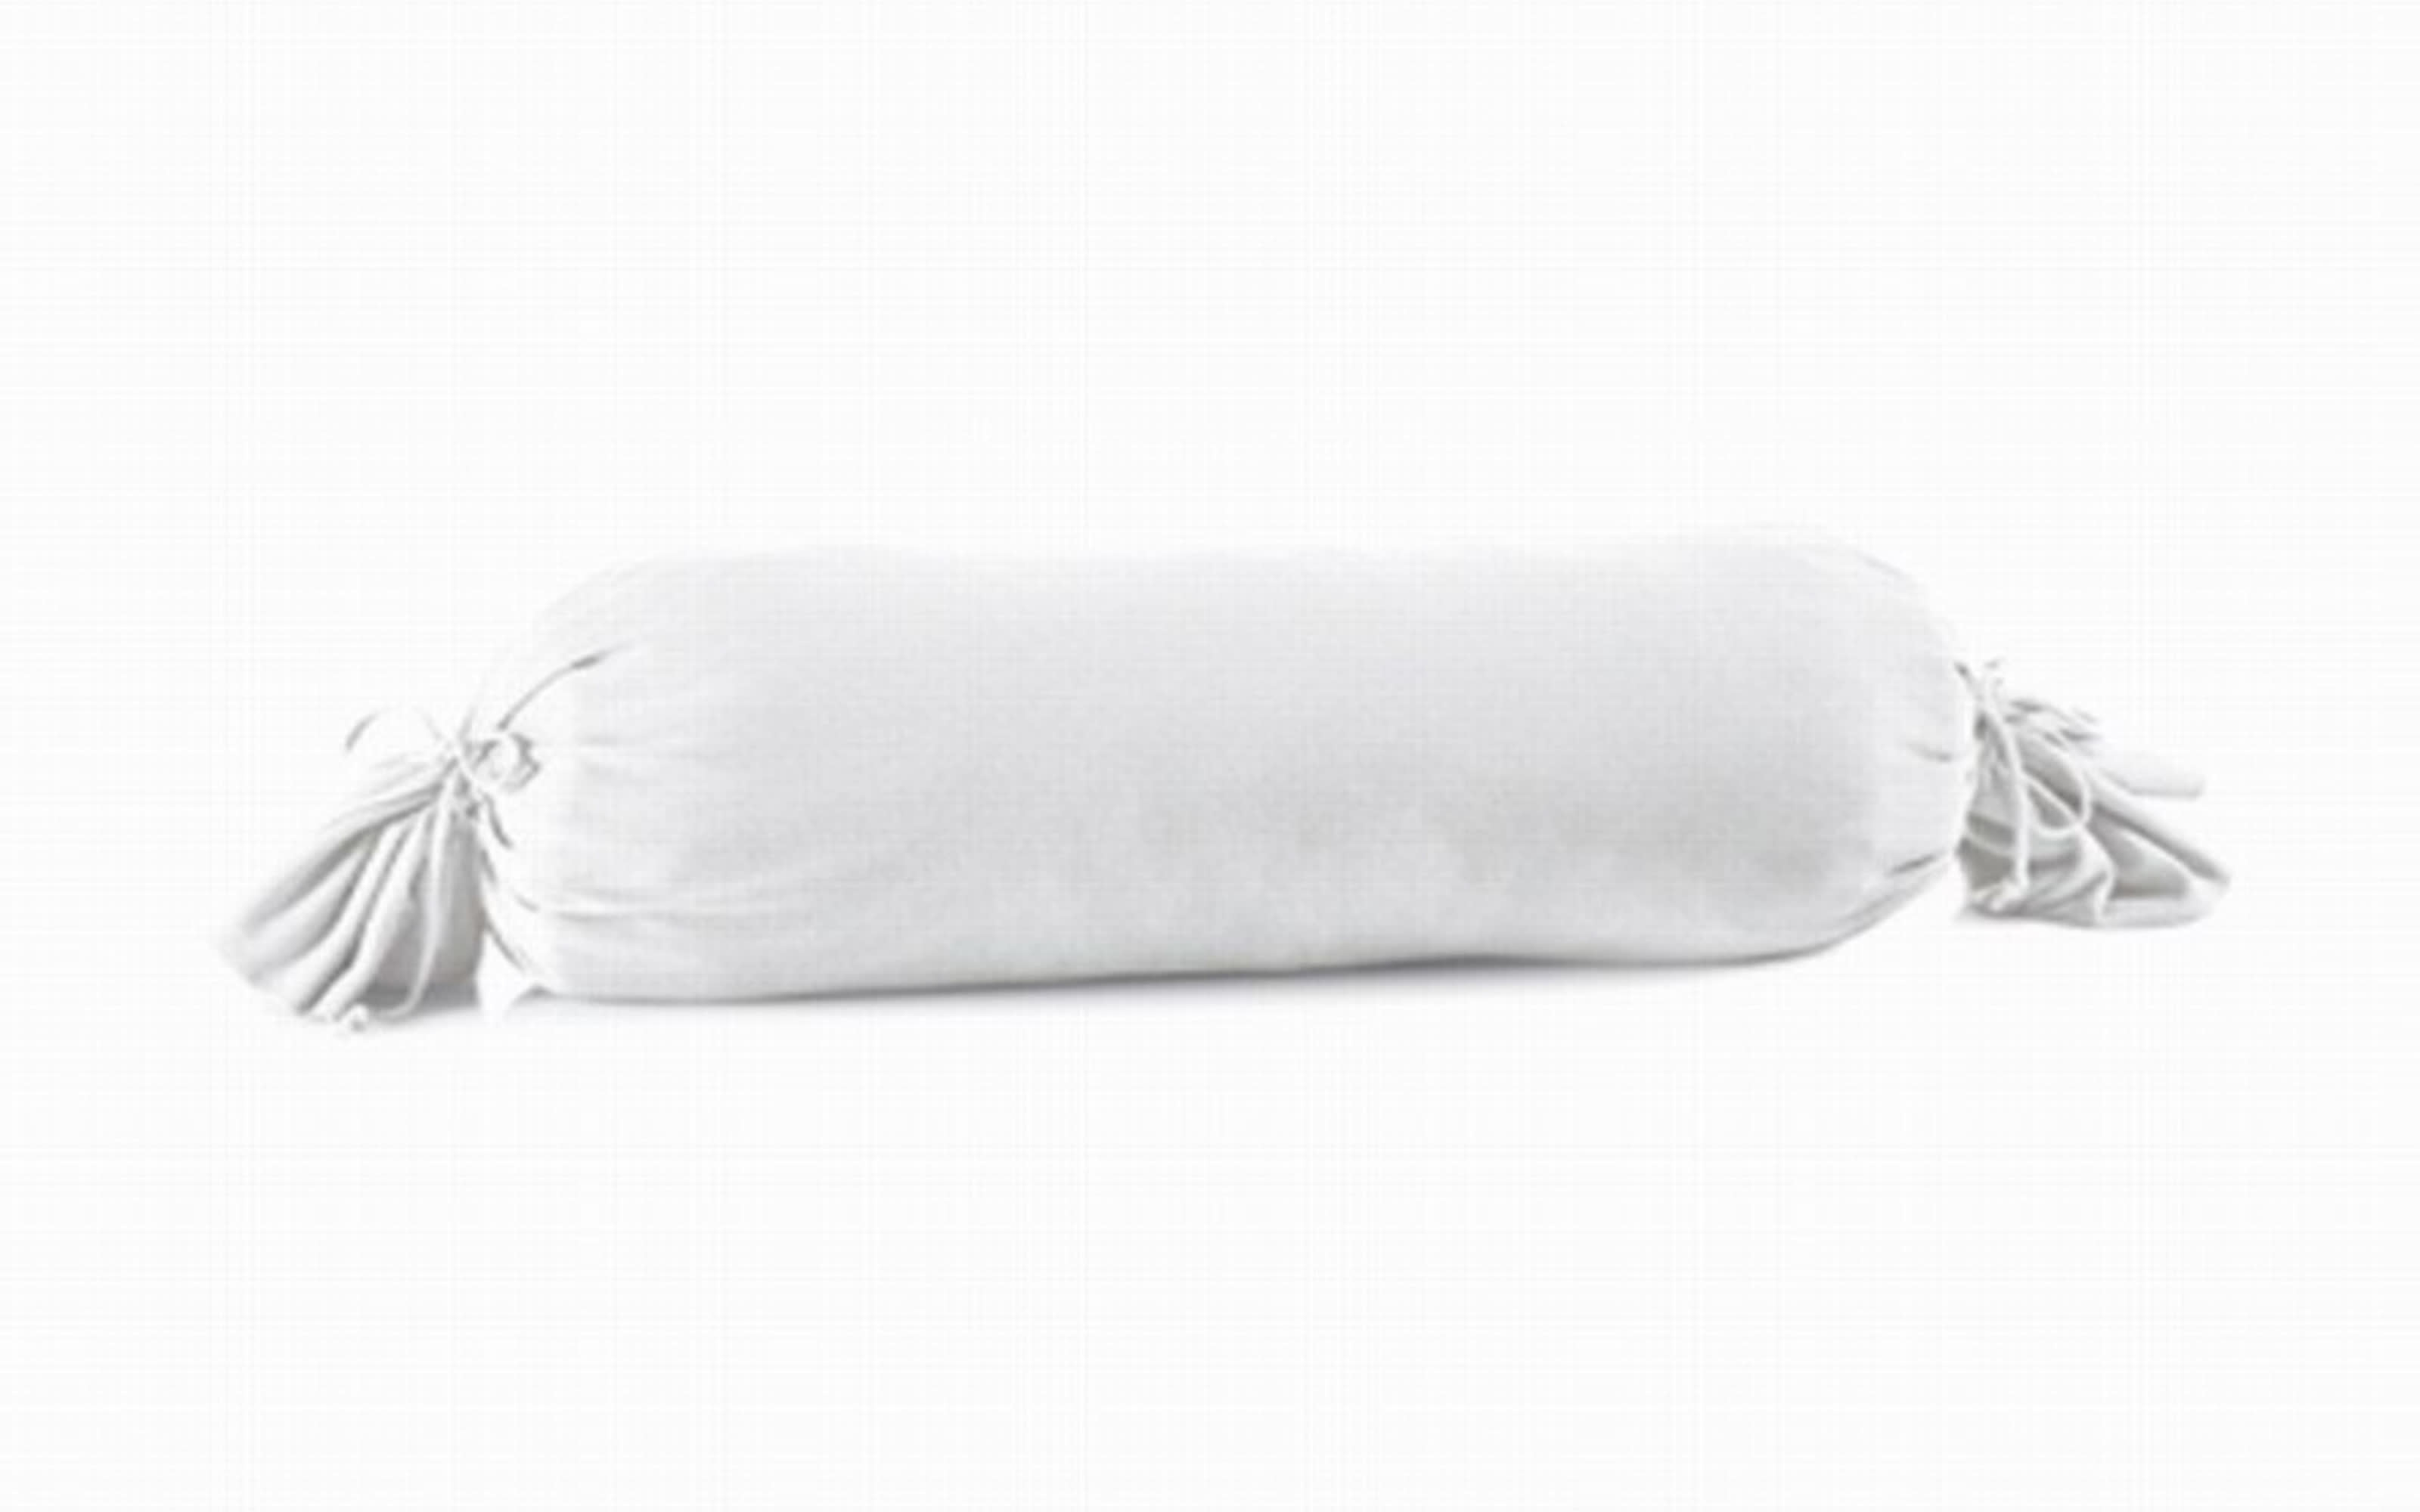 Kissenbezug Mako Jersey in weiß, 15 x 40 cm